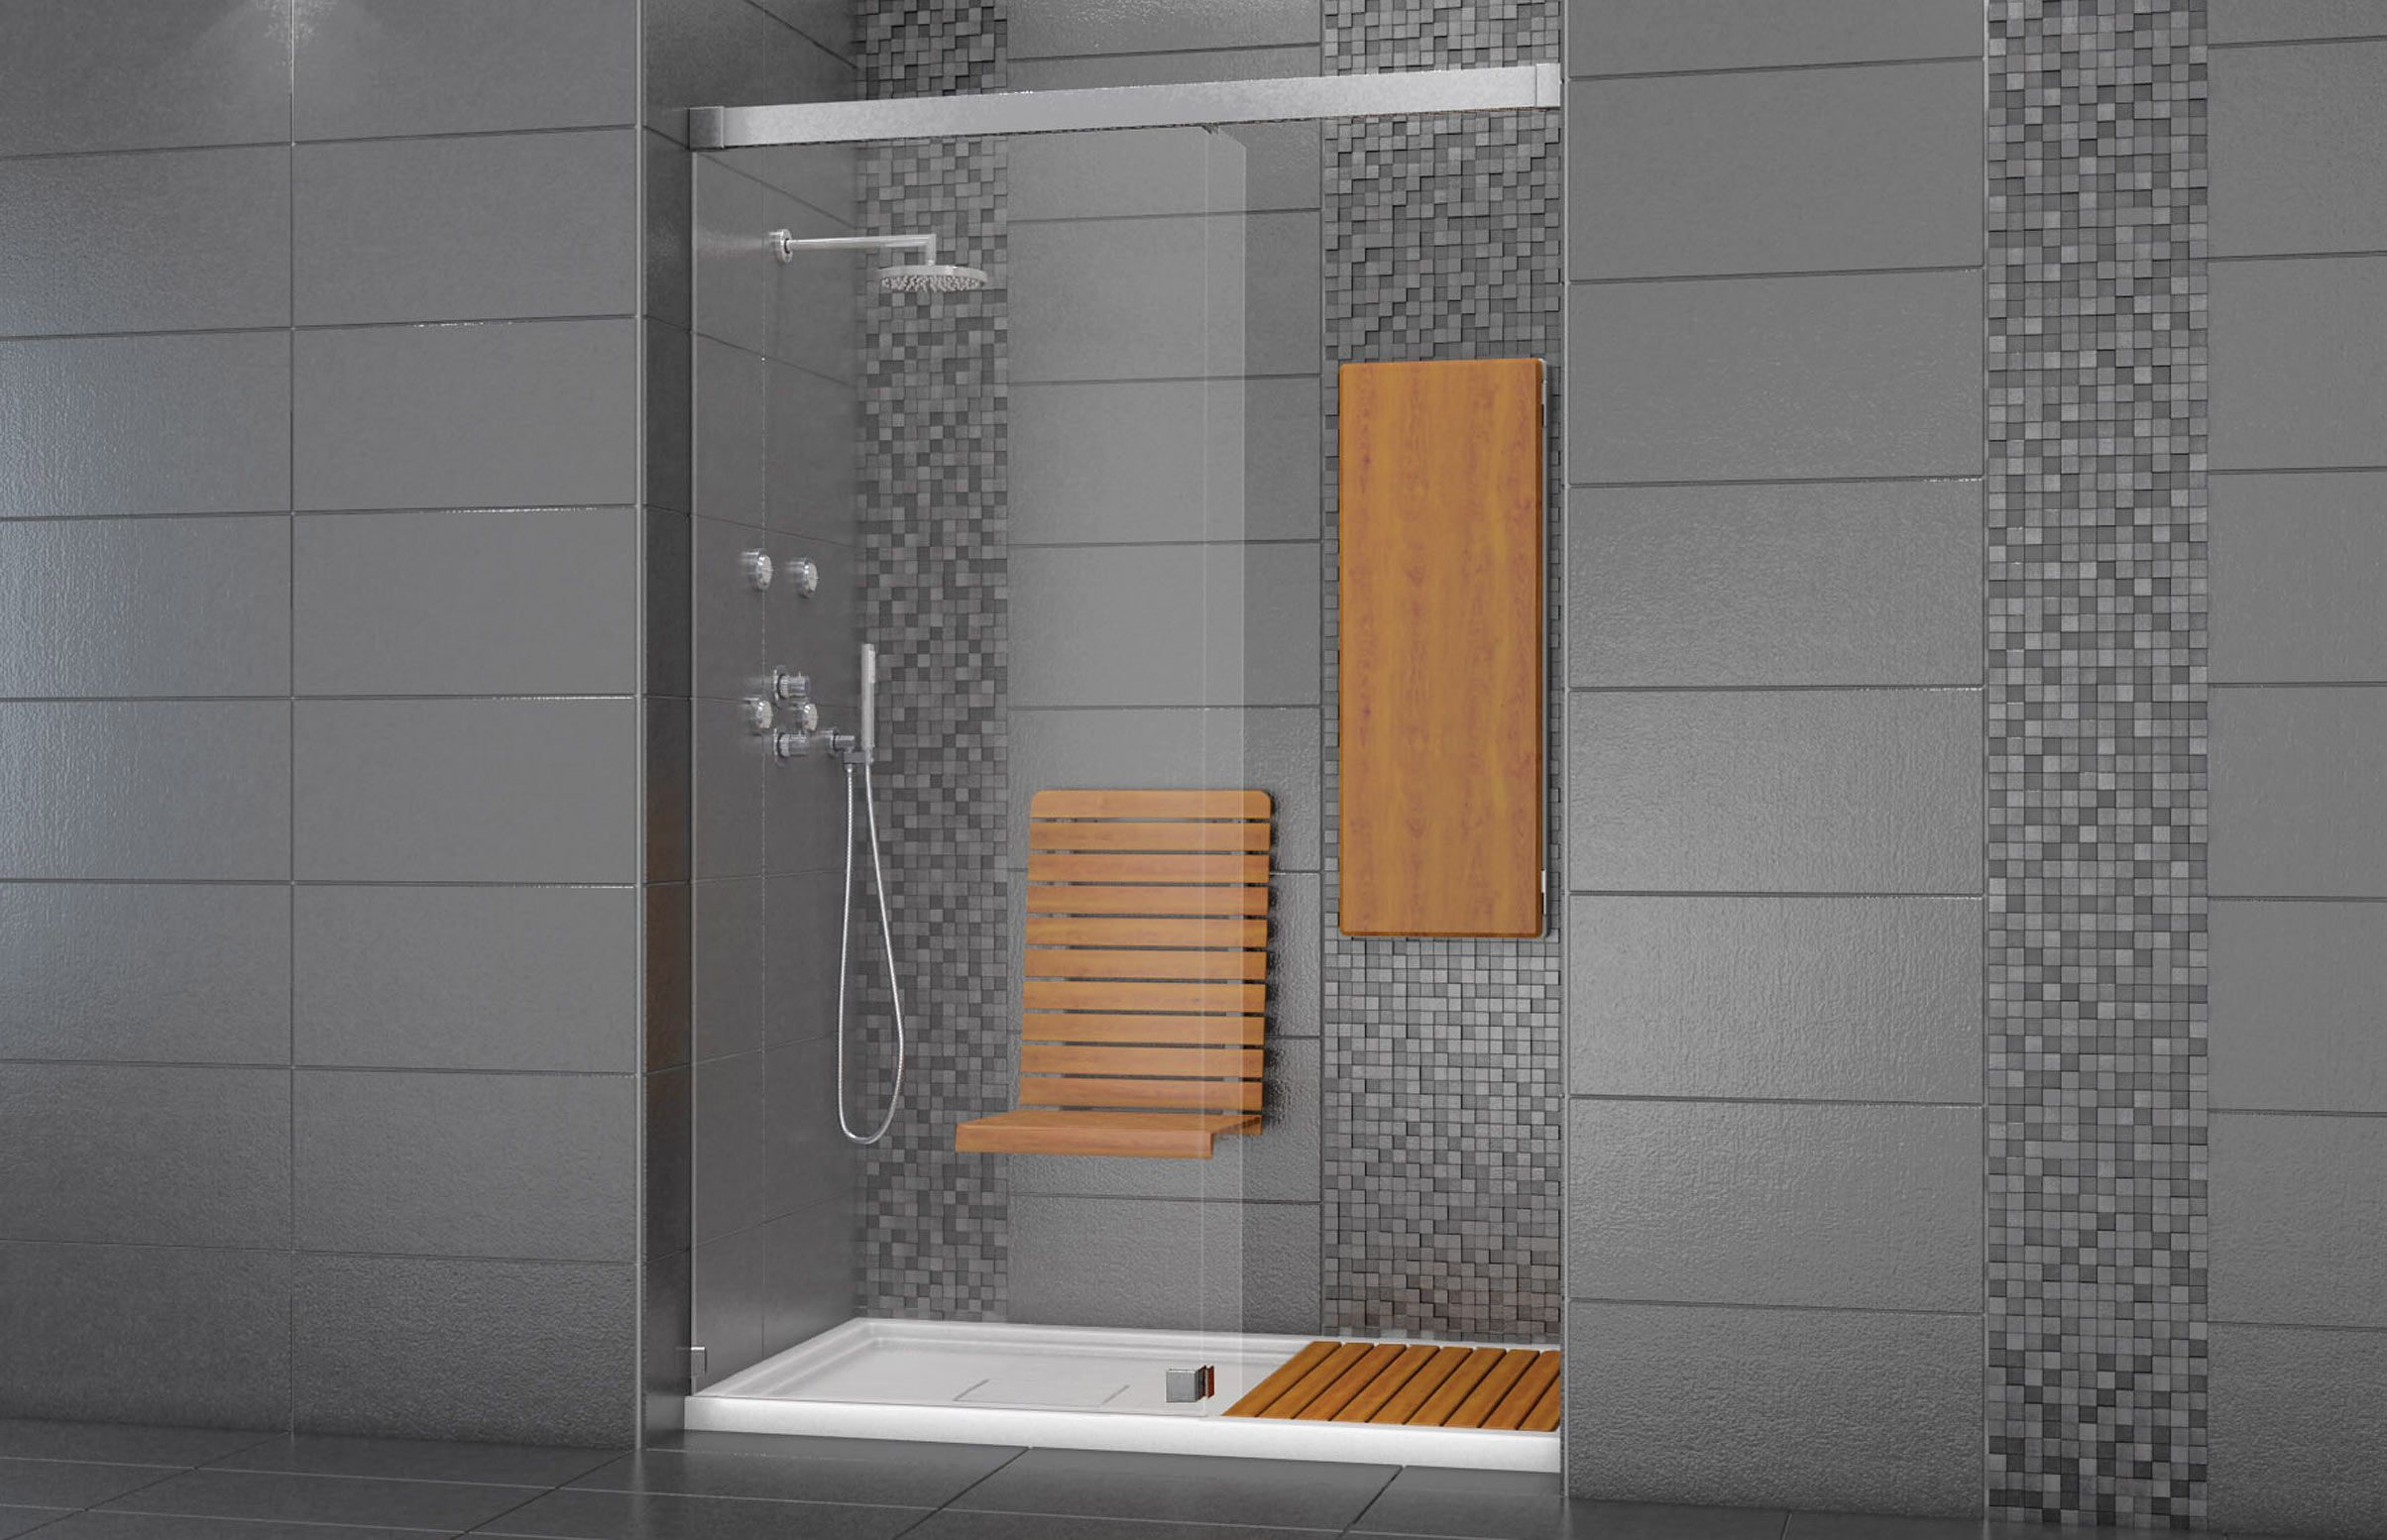 cramique douche  Recherche Google  Salle de bain  Pinterest  Douche Salle de Bain et Salle